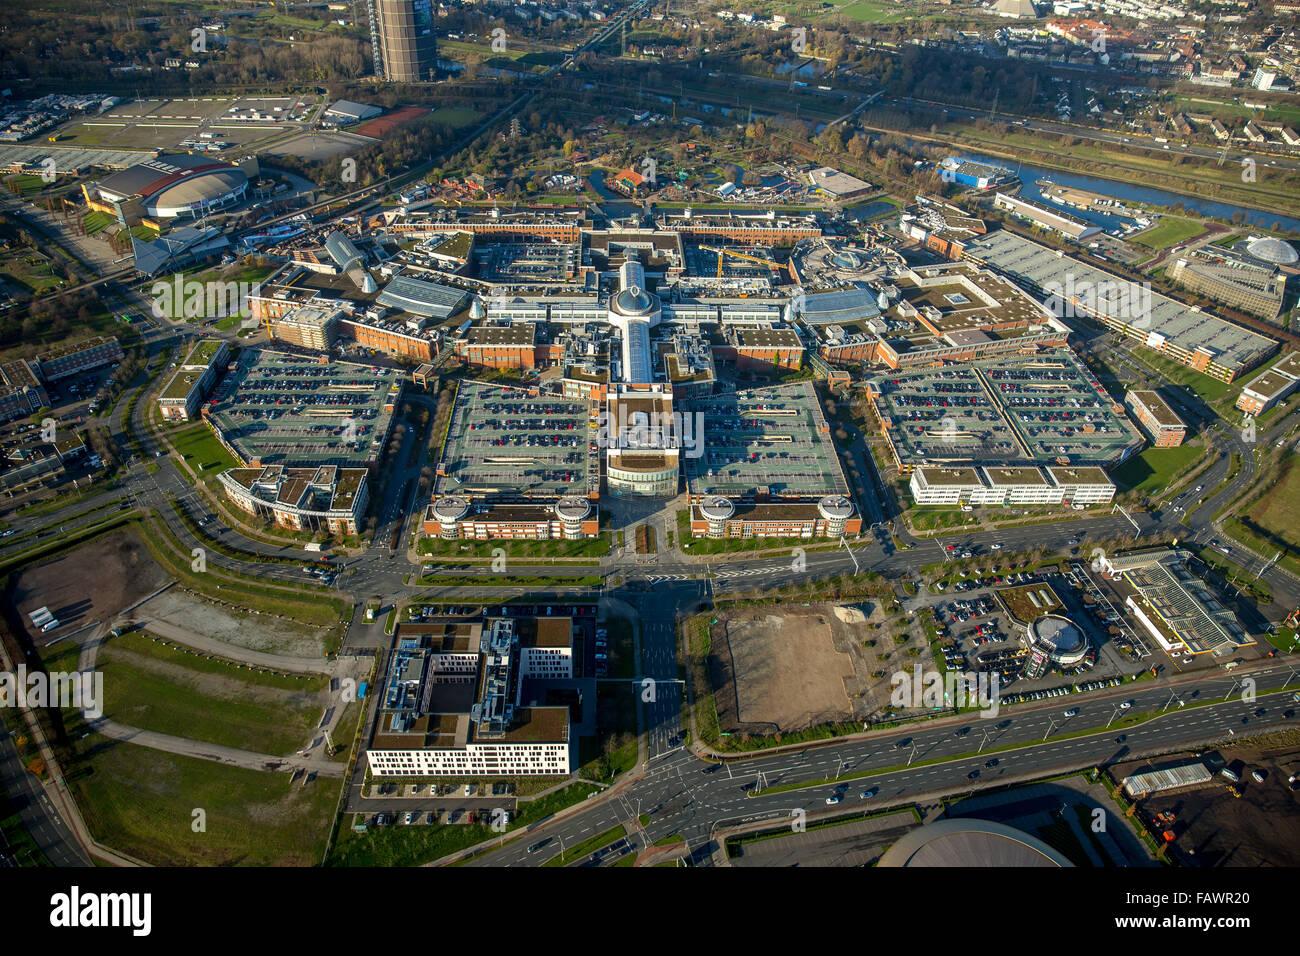 Shopping center, Centro Oberhausen, Oberhausen, Ruhr district, North Rhine-Westphalia, Germany - Stock Image